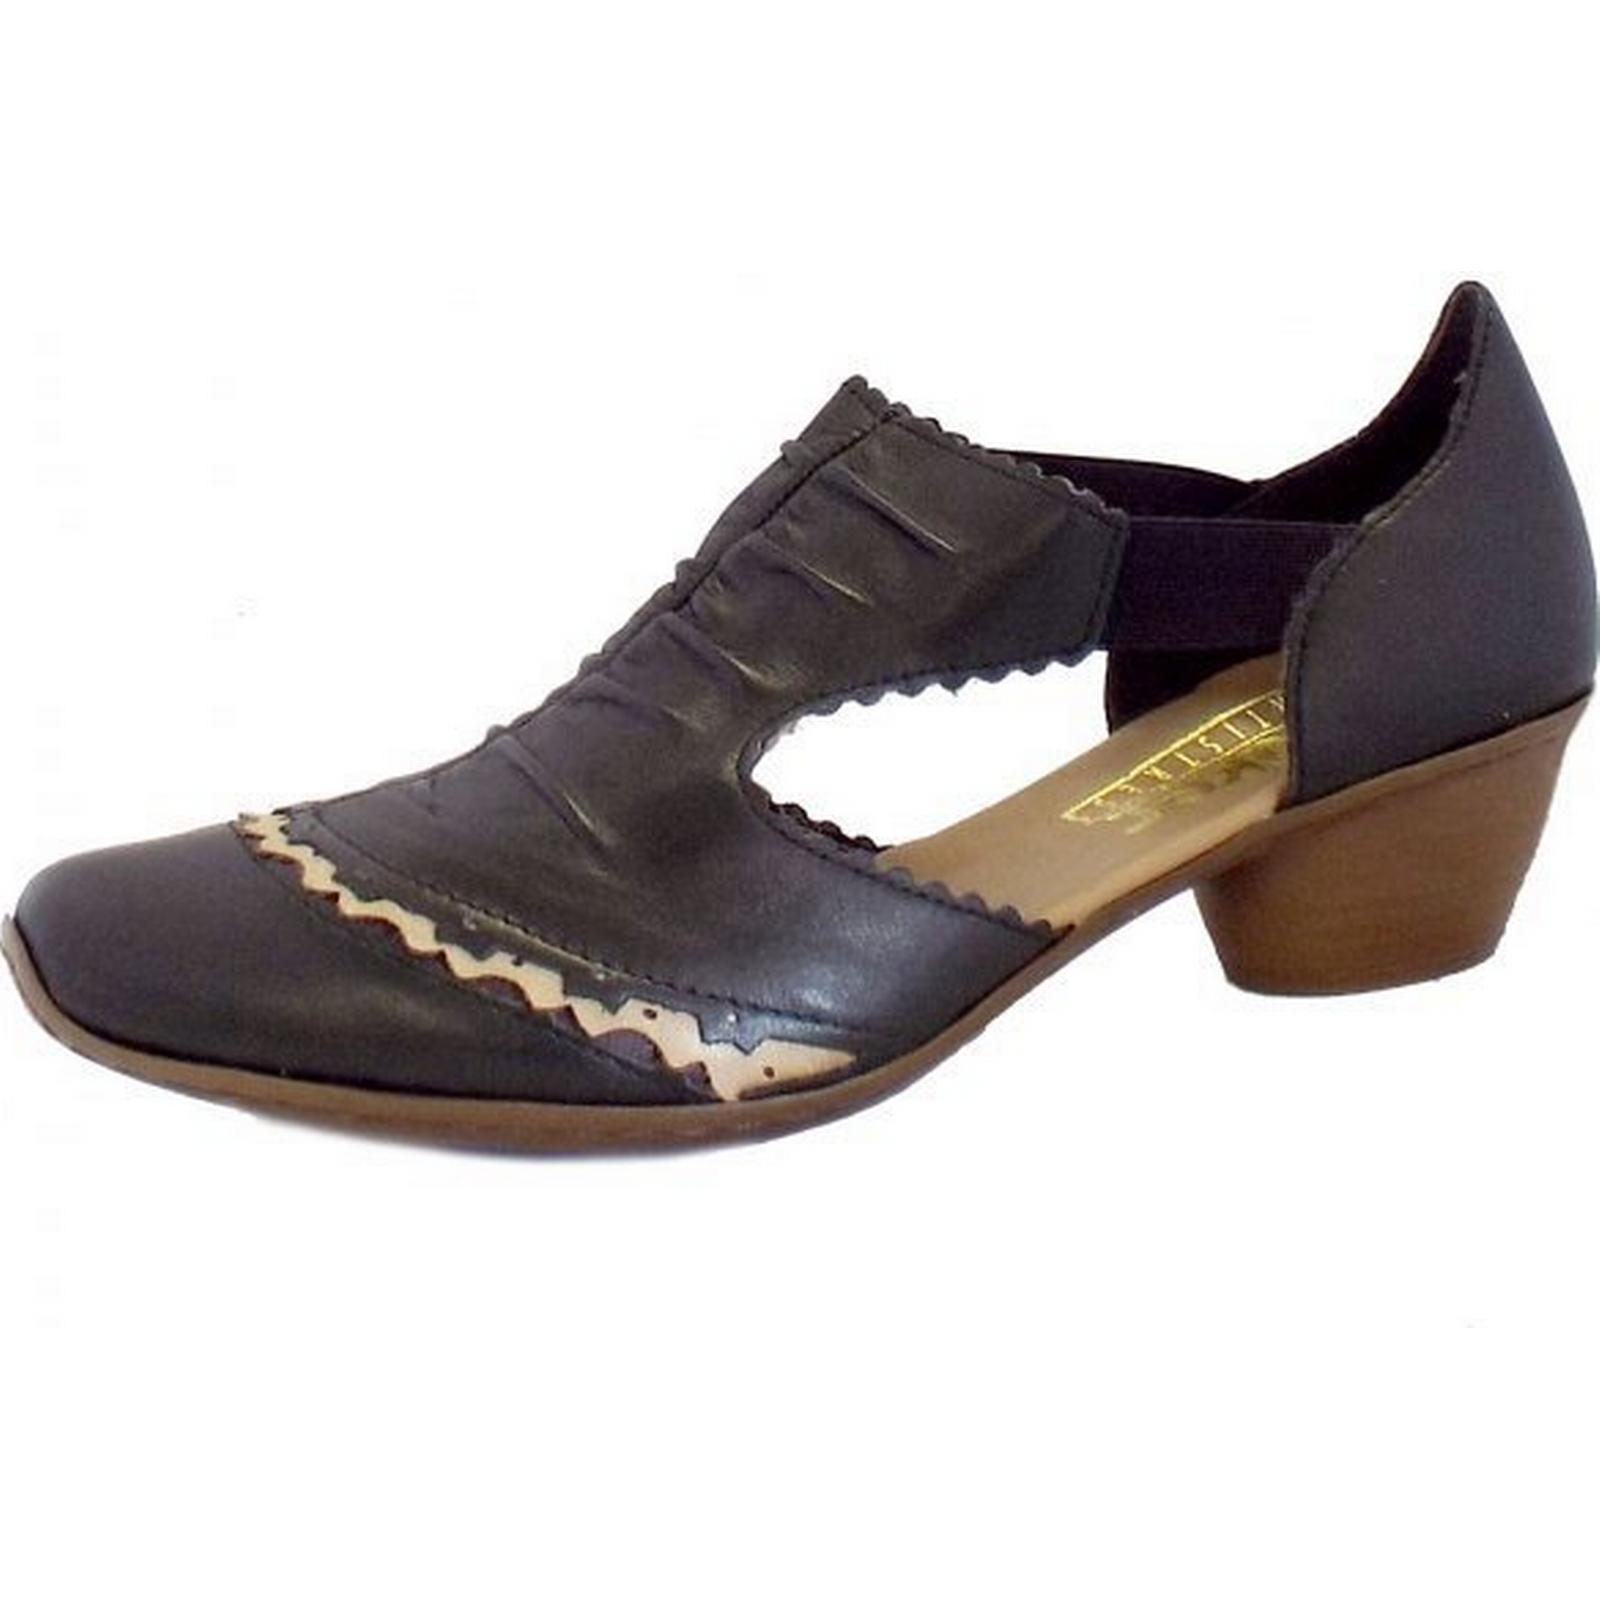 rieker hartley rieker mesdames summer noir chaussures taille: 38, la couleur: noir summer c404d0